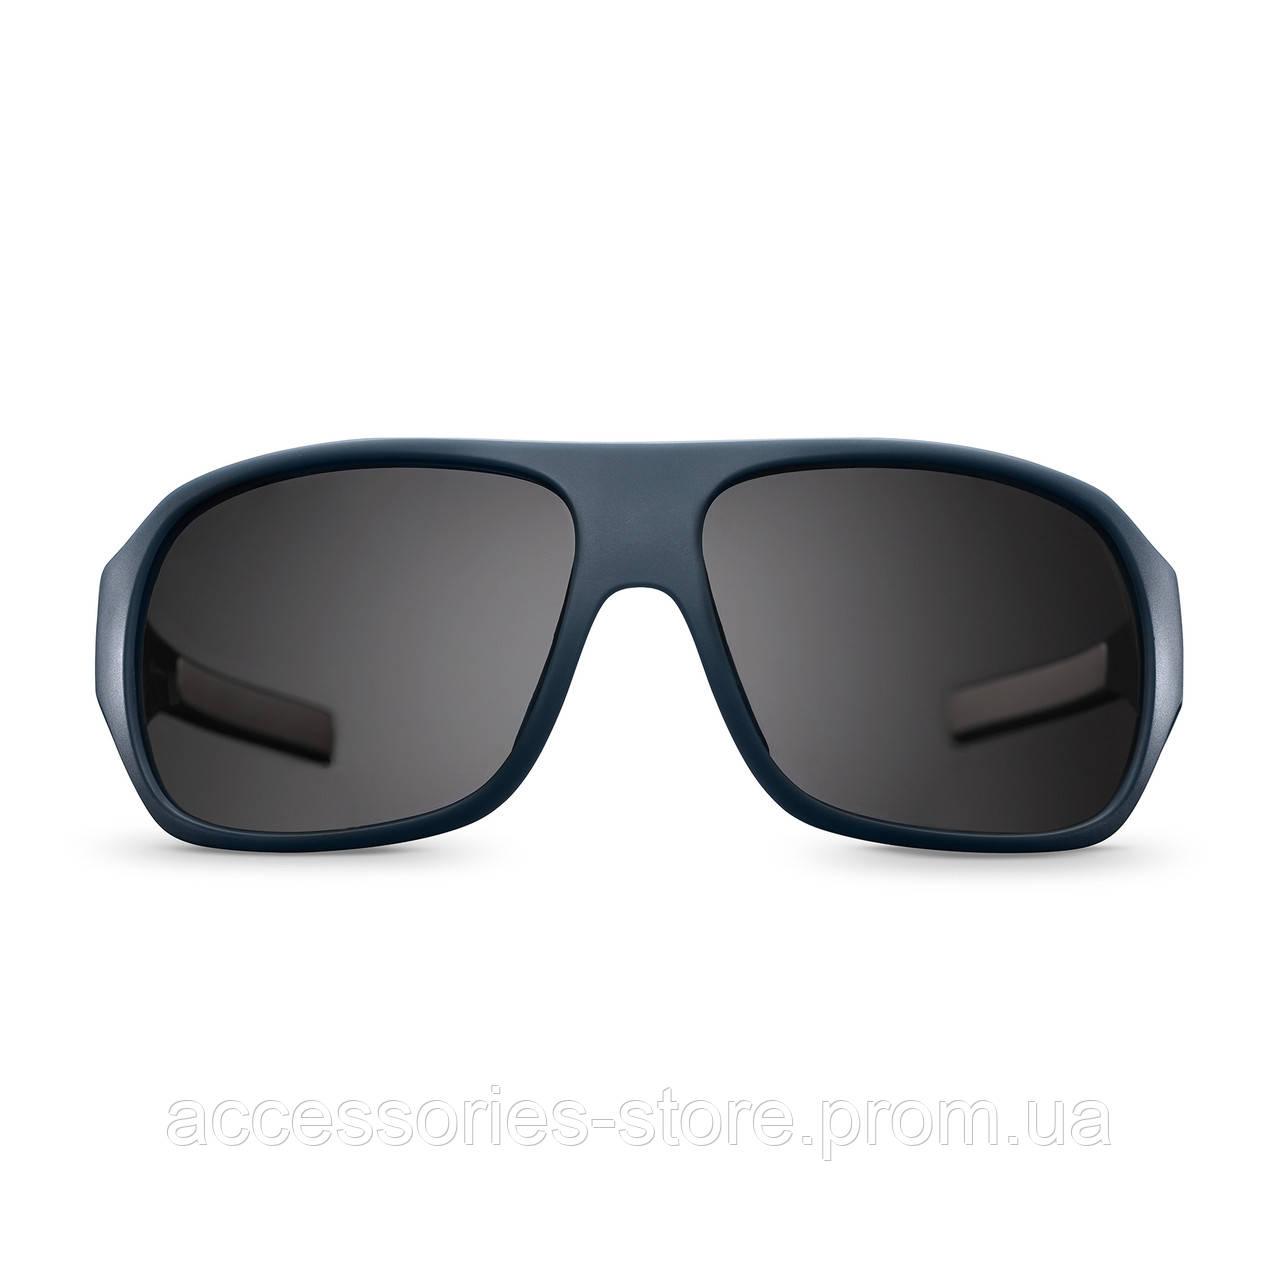 Cолнцезащитные очки Volvo Poc Do Low, Sunglasses